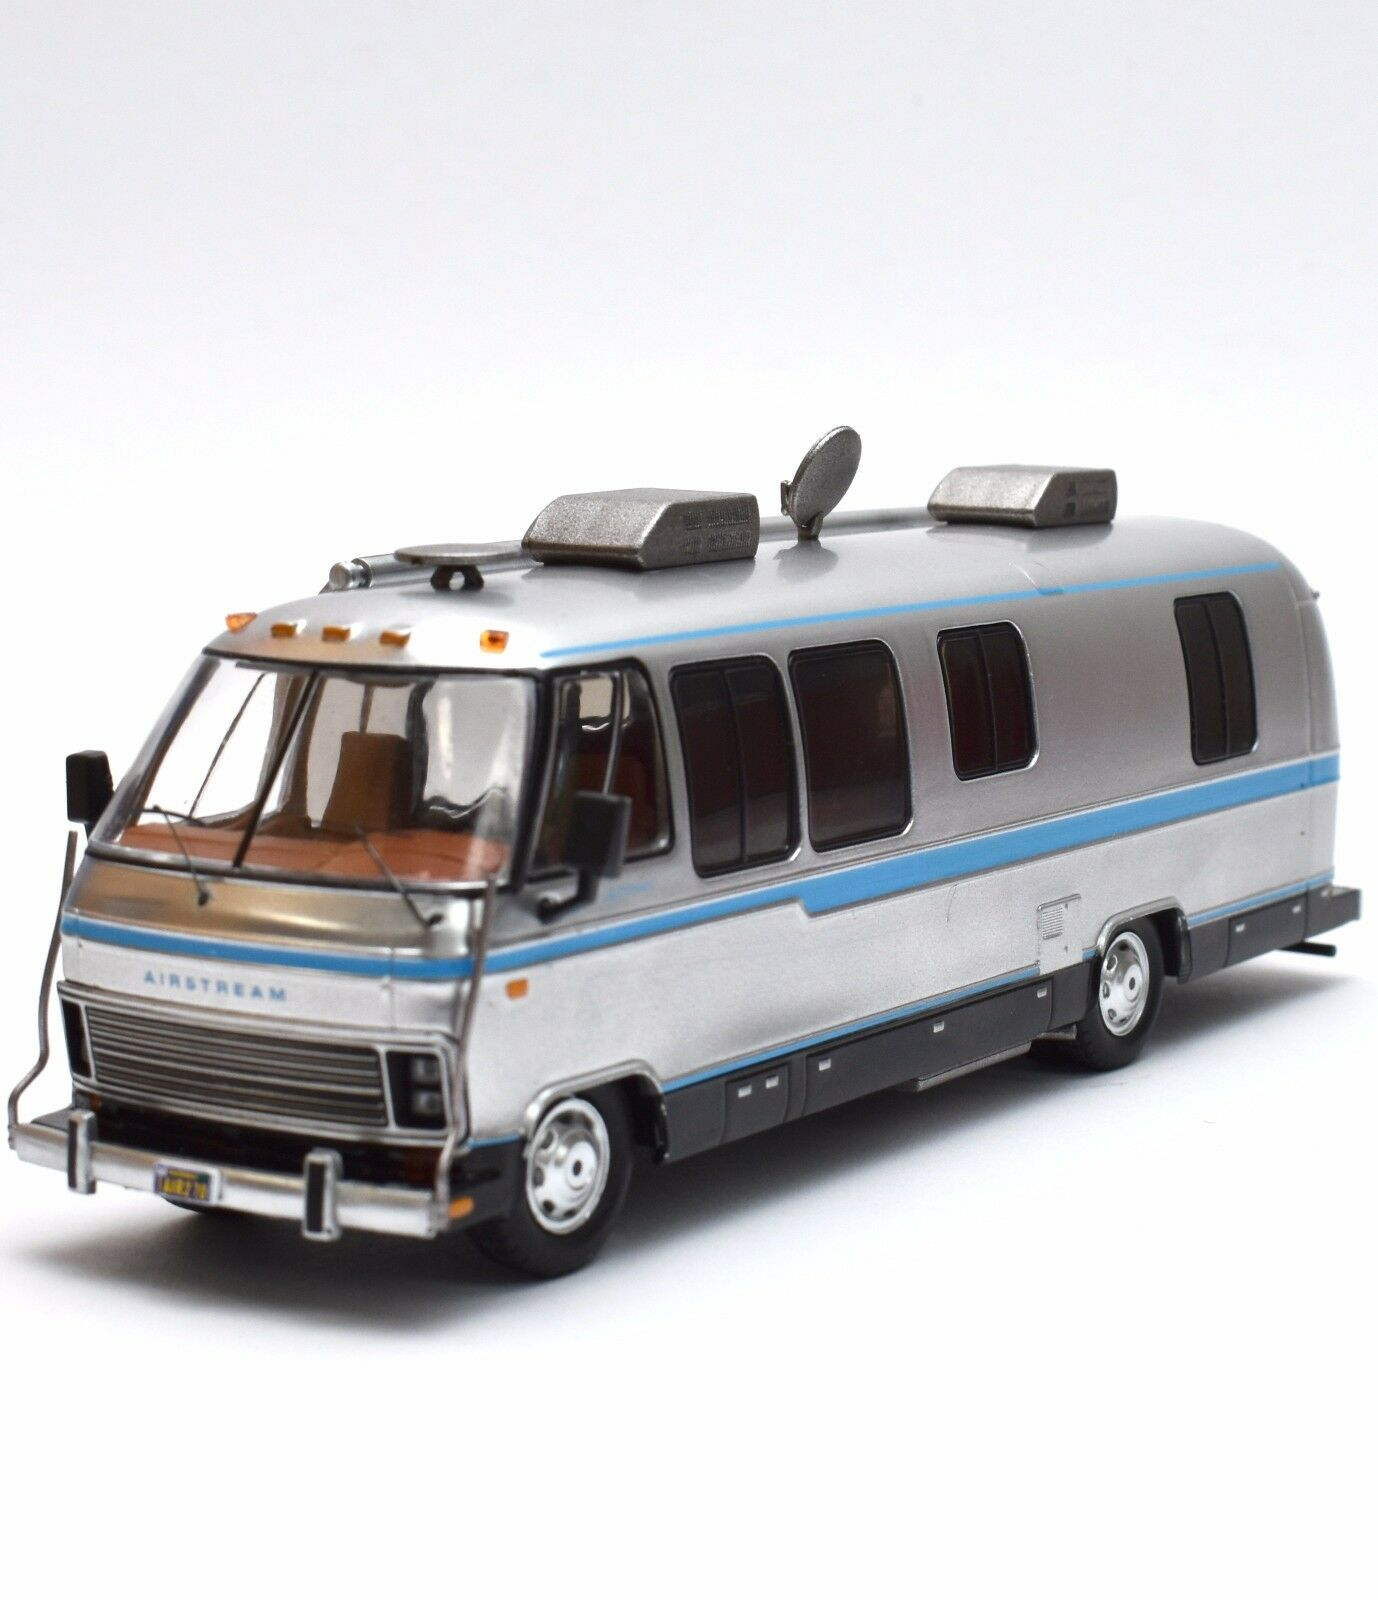 IXO Airstream Exella 280 Turbo Wohnmobil USA Camping Car 1981, 1 43 , OVP, B305    Schöne Farbe